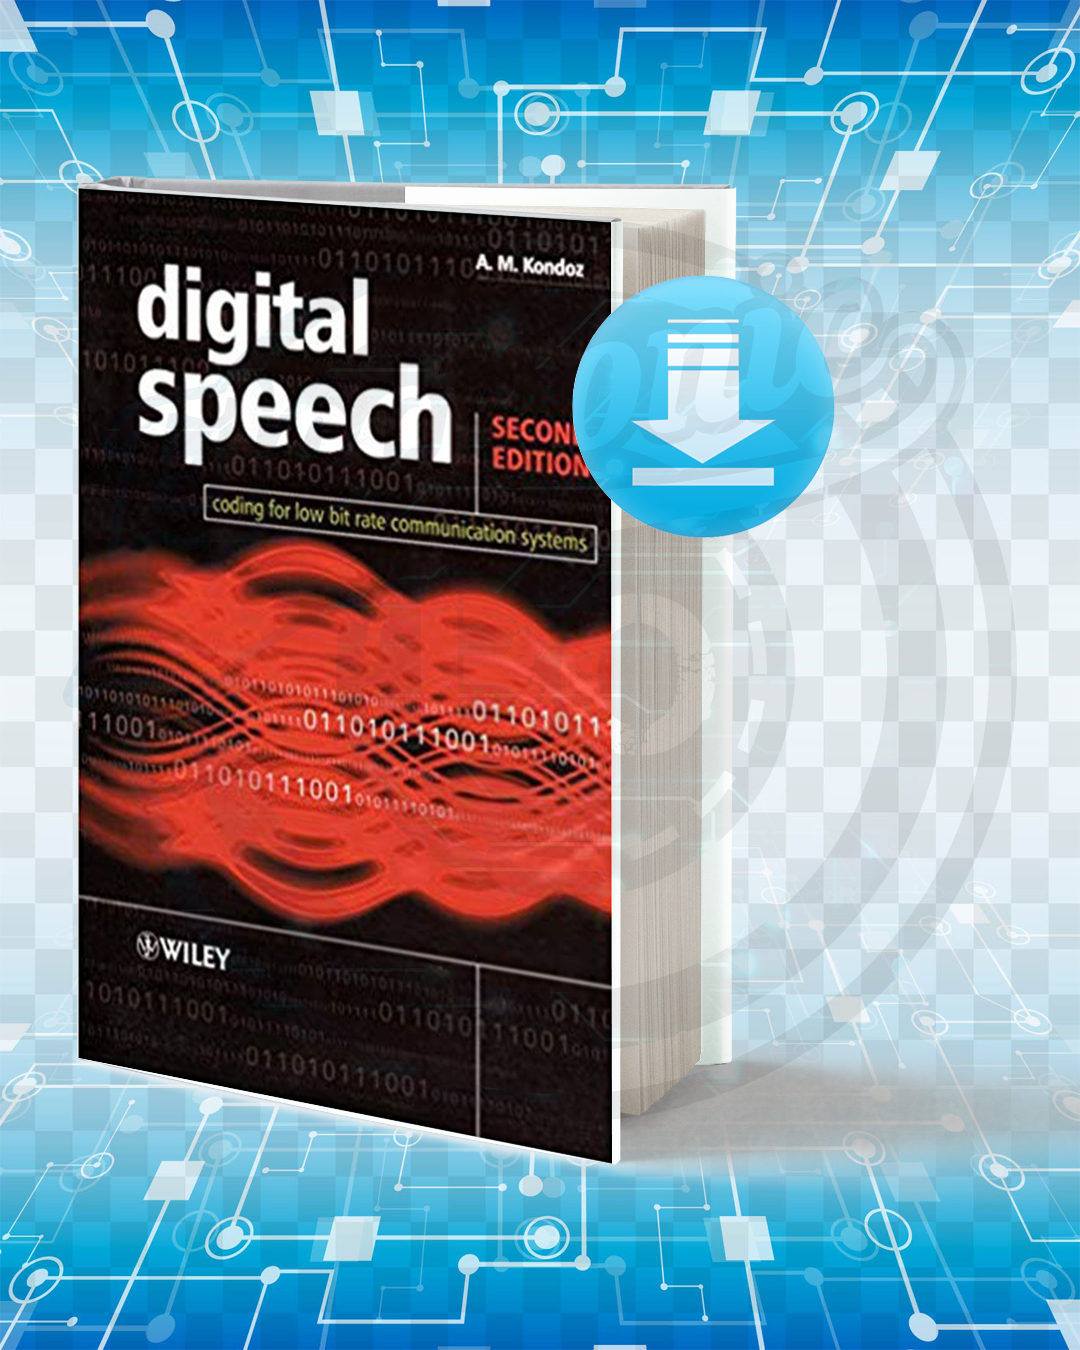 Free Book Digital Speech pdf.